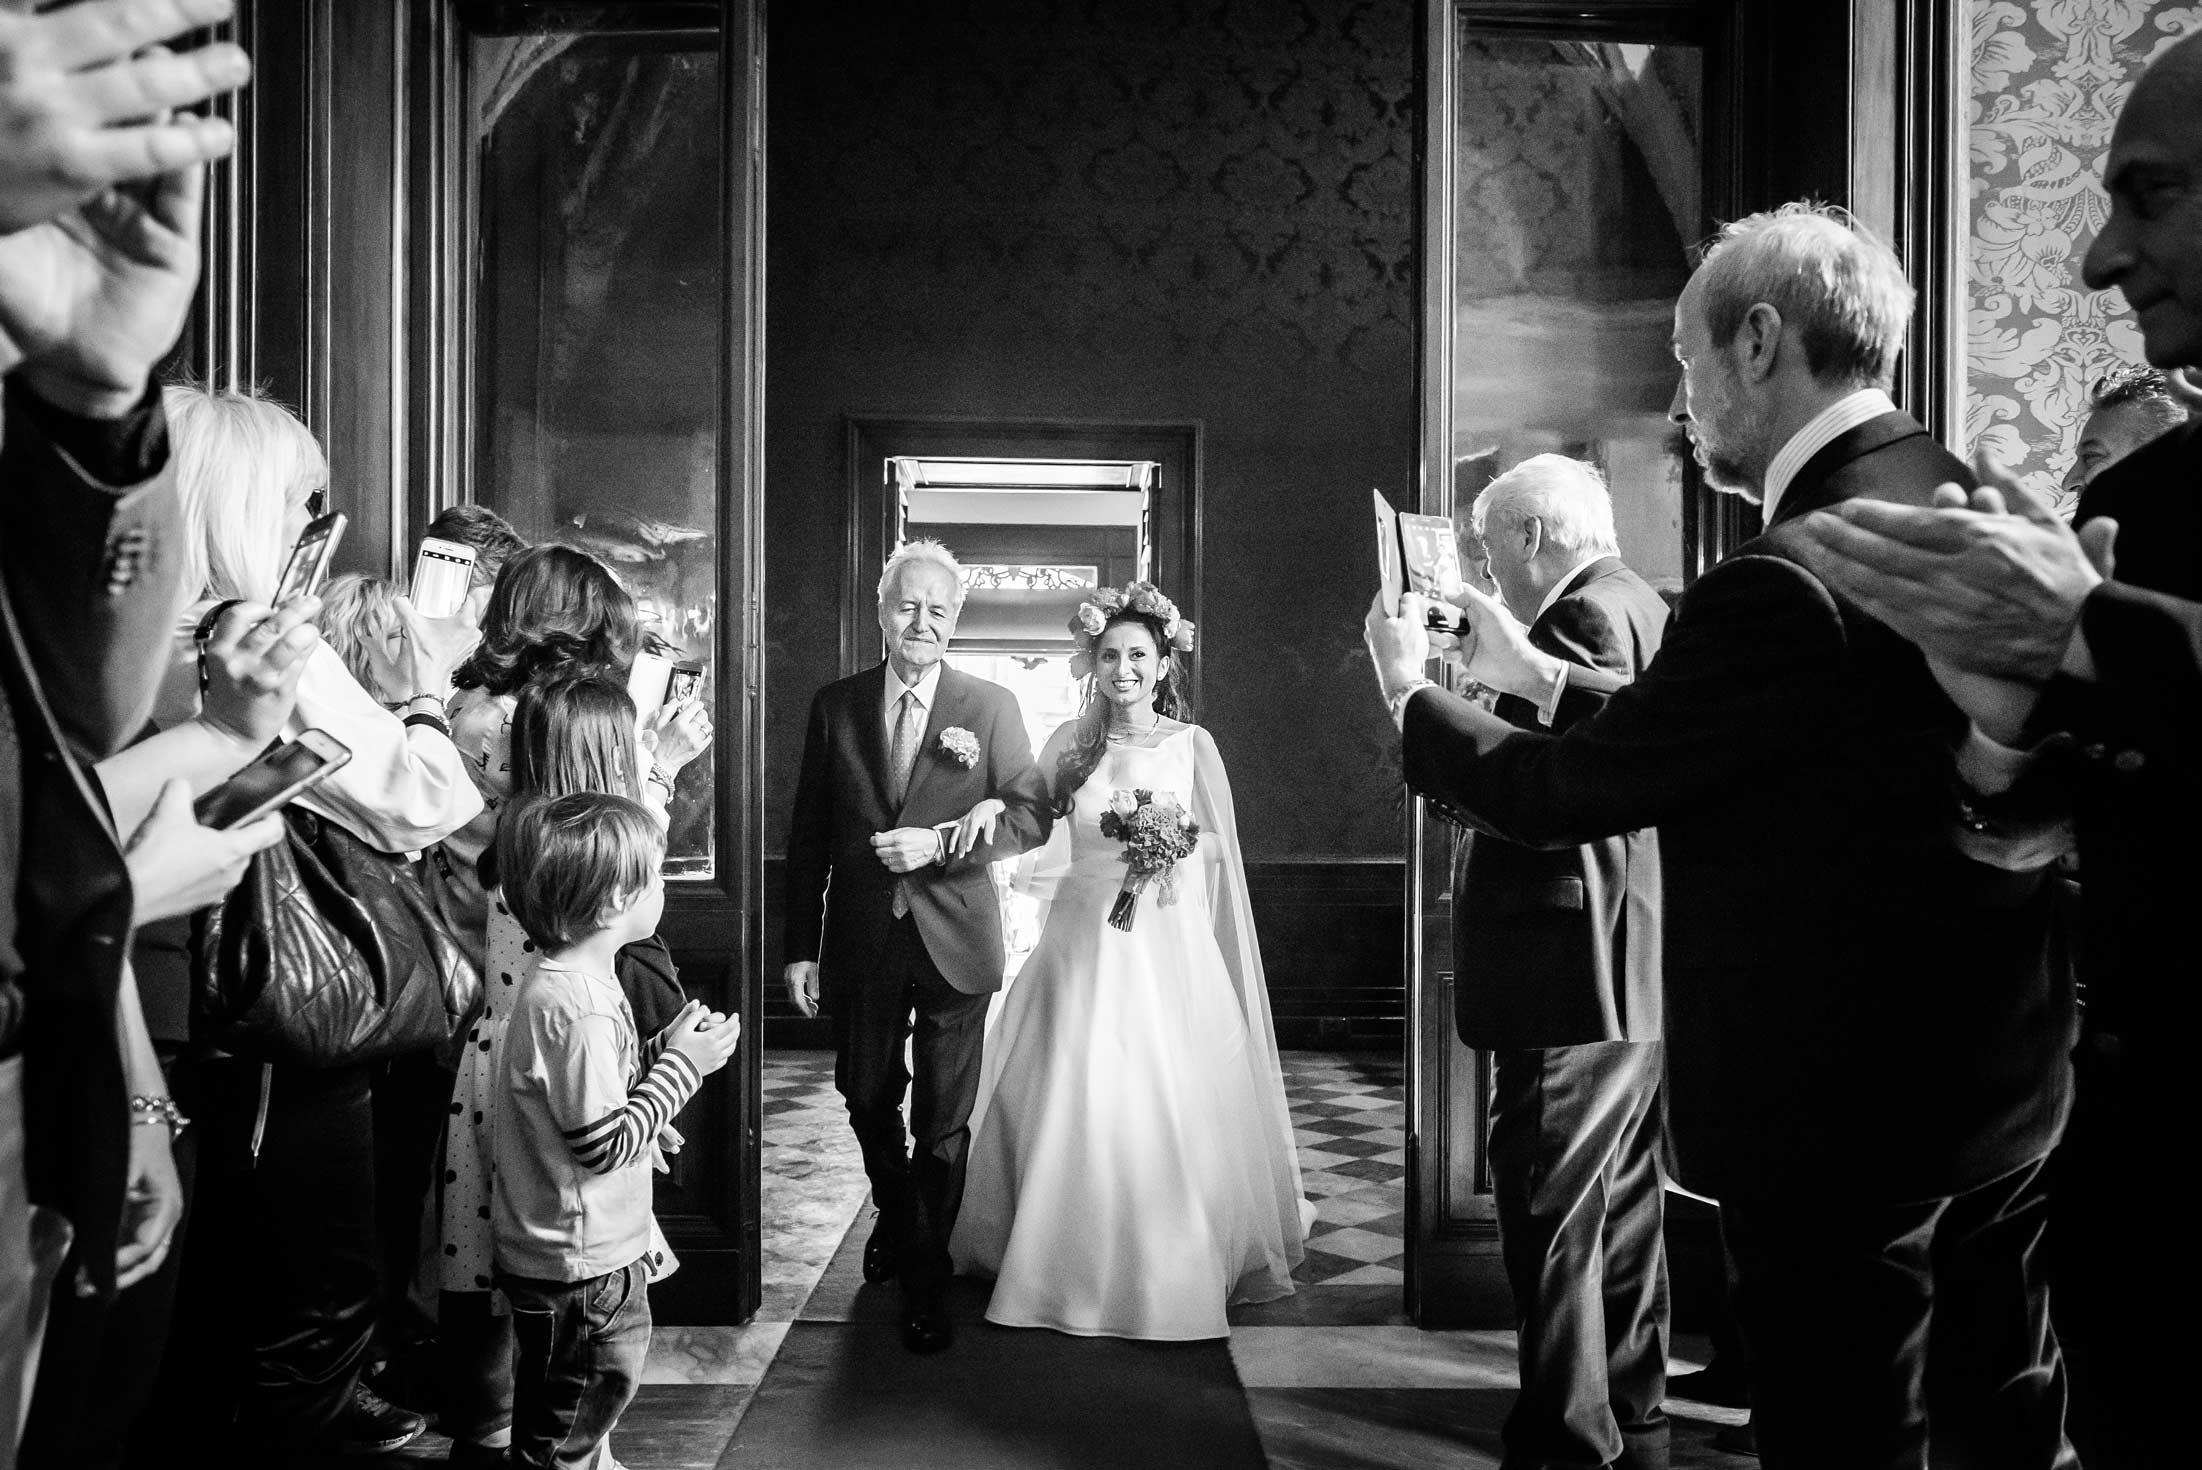 Destination-Wedding-Italy-Documentary-Wedding-Photography-Ceremony